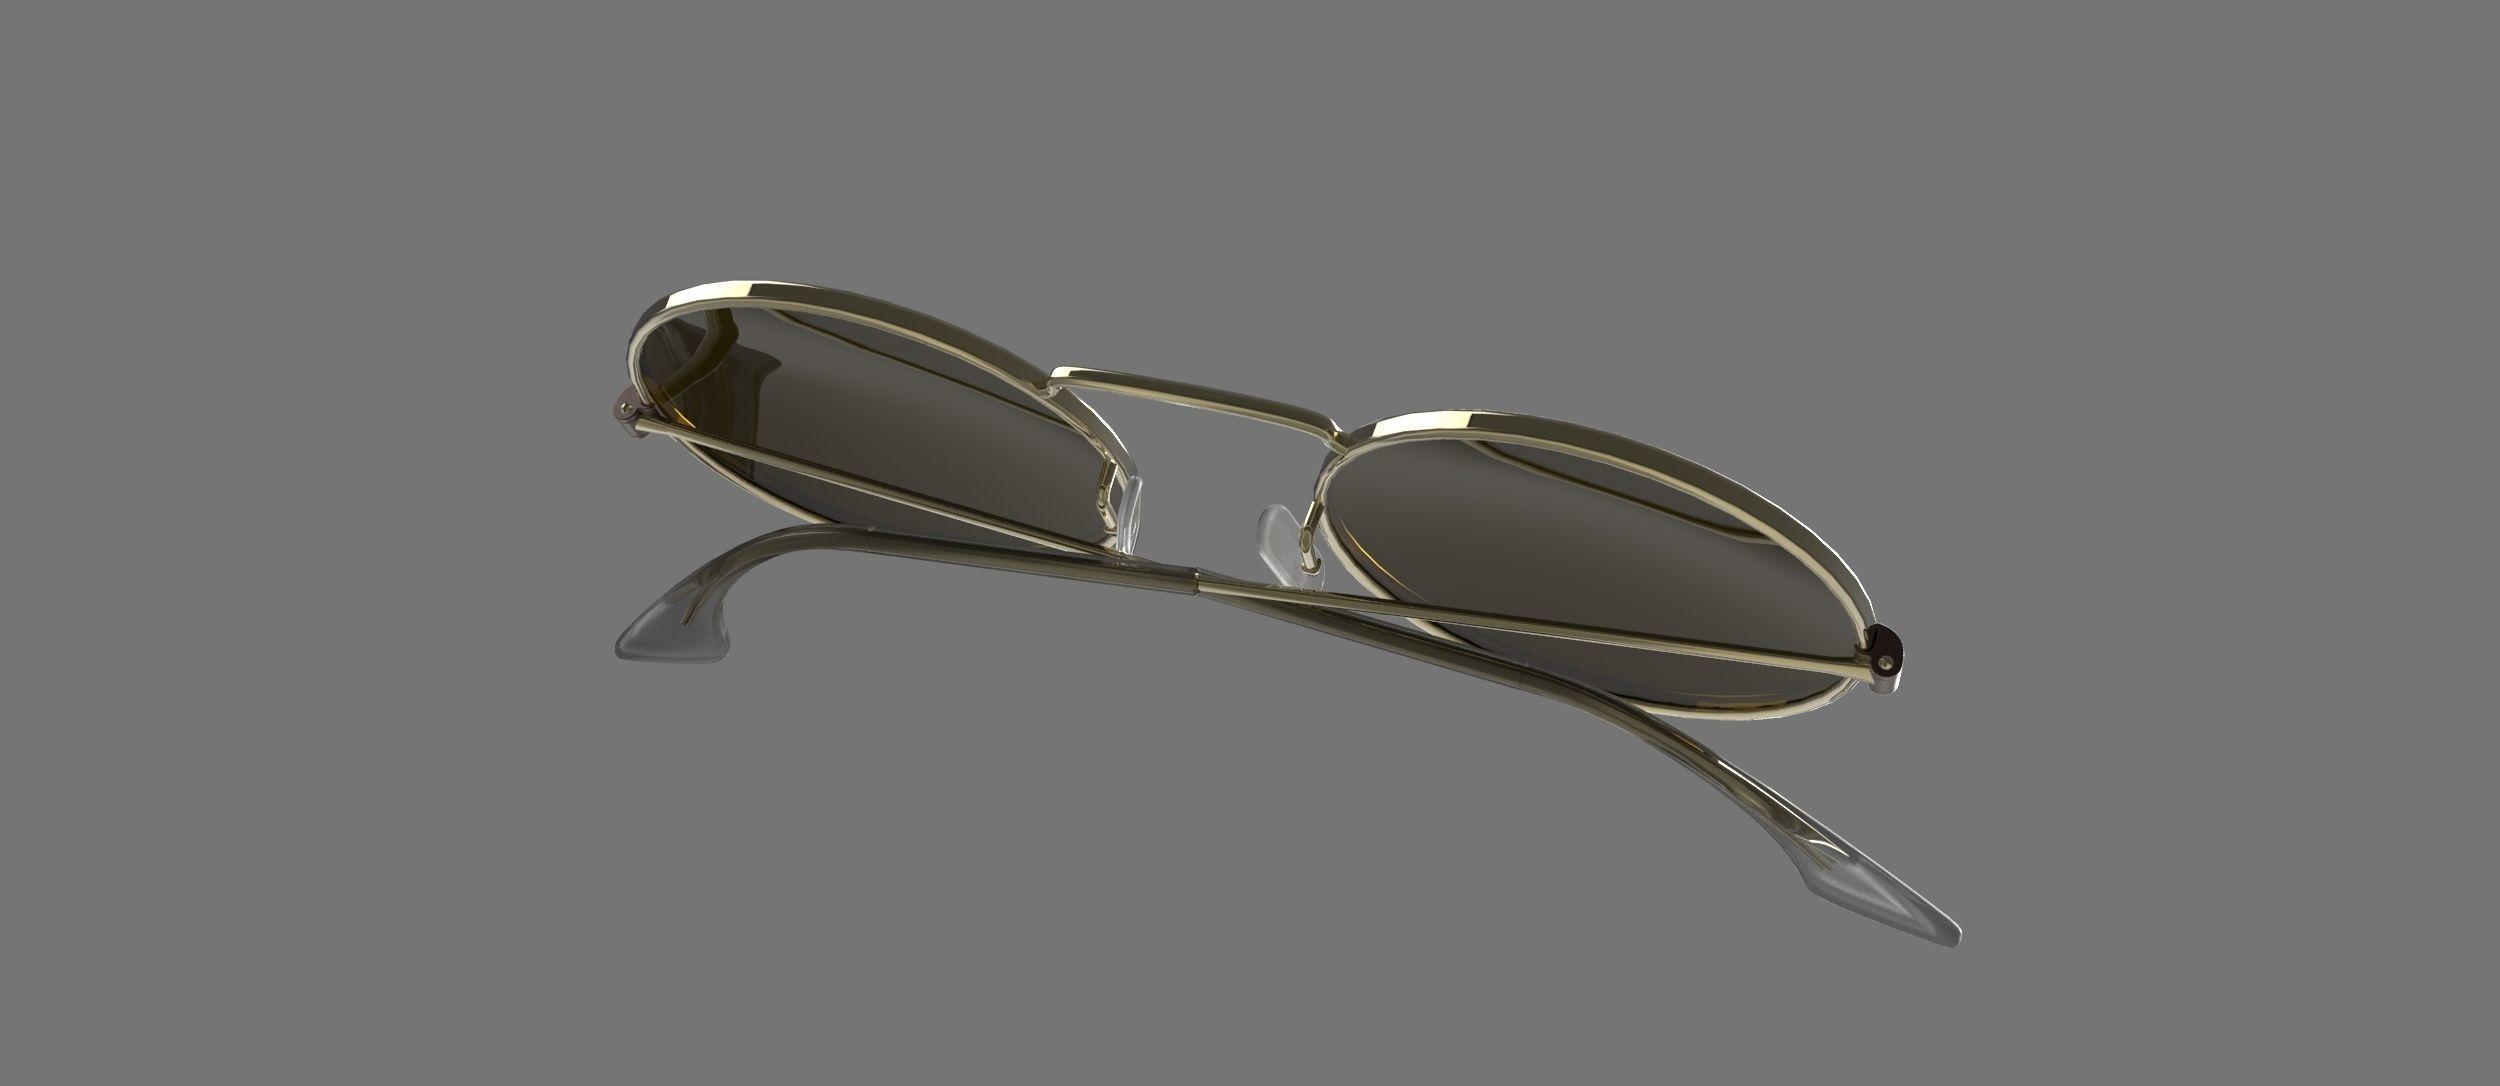 79d2d2a6f9 ... sunglasses round 1 3d model low-poly max obj mtl 3ds fbx sldprt sldasm  slddrw ...